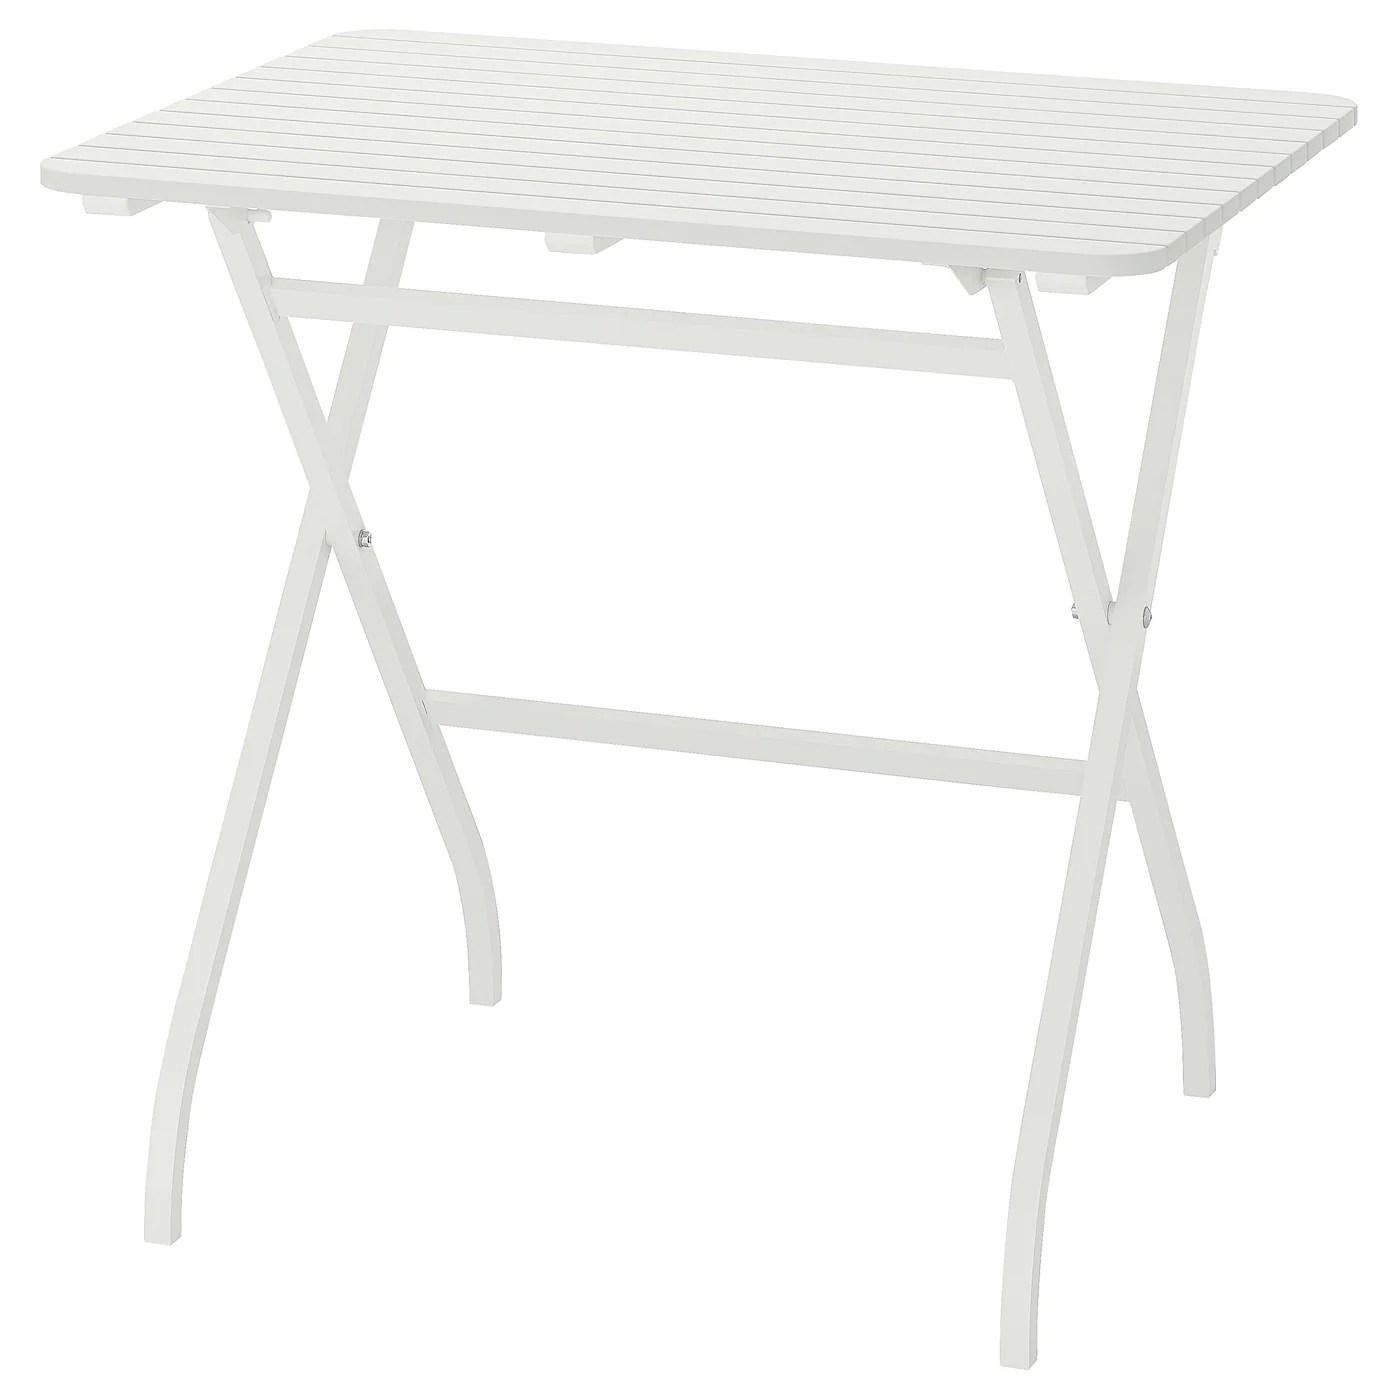 malaro table exterieur pliable blanc 80x62 cm